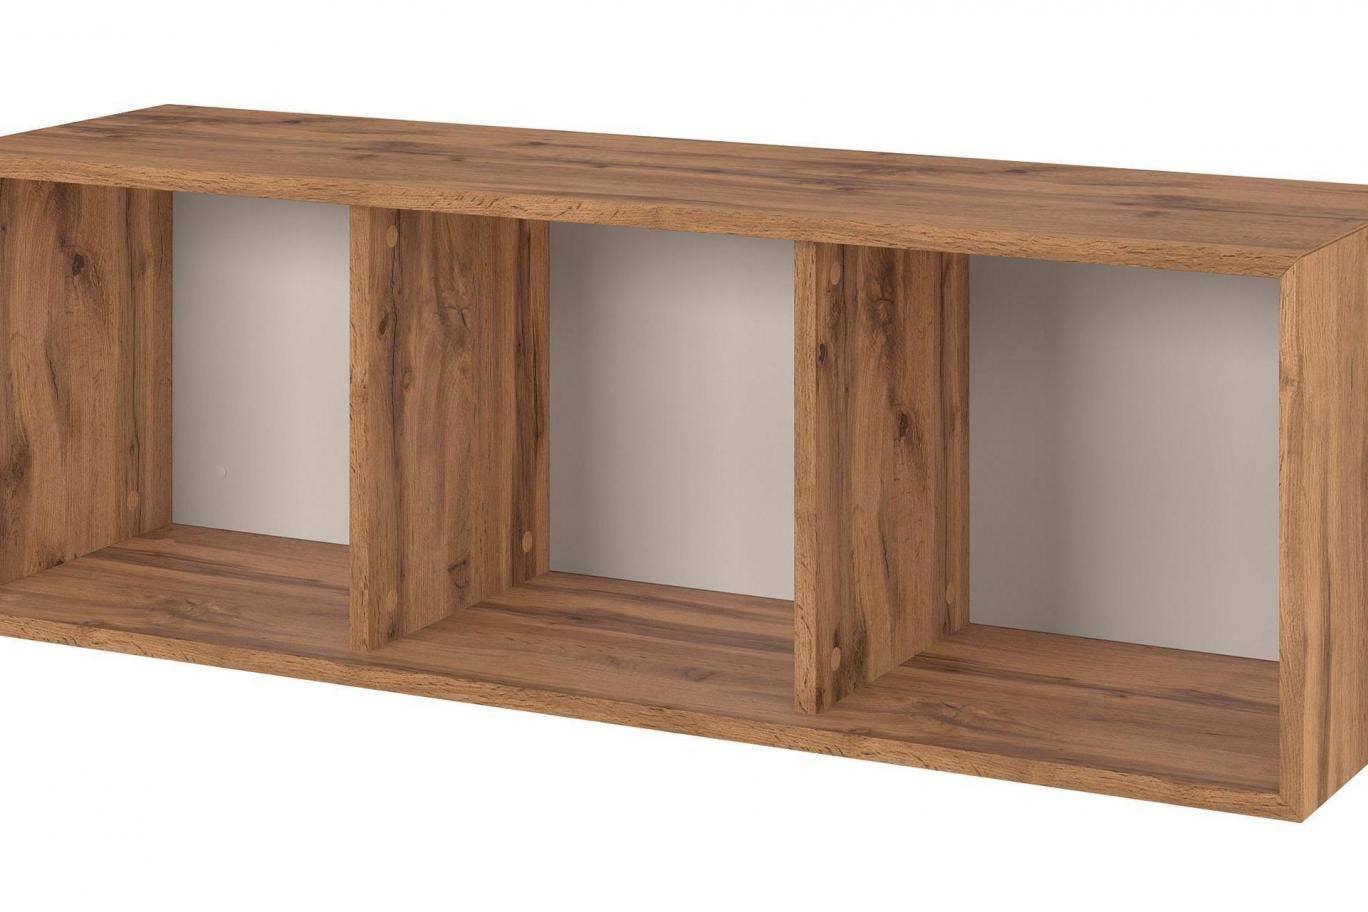 Full Size of Designer Interiors For Less Forget 900 A Jochen Flacke Piece Wohnzimmer Combine Modulregal